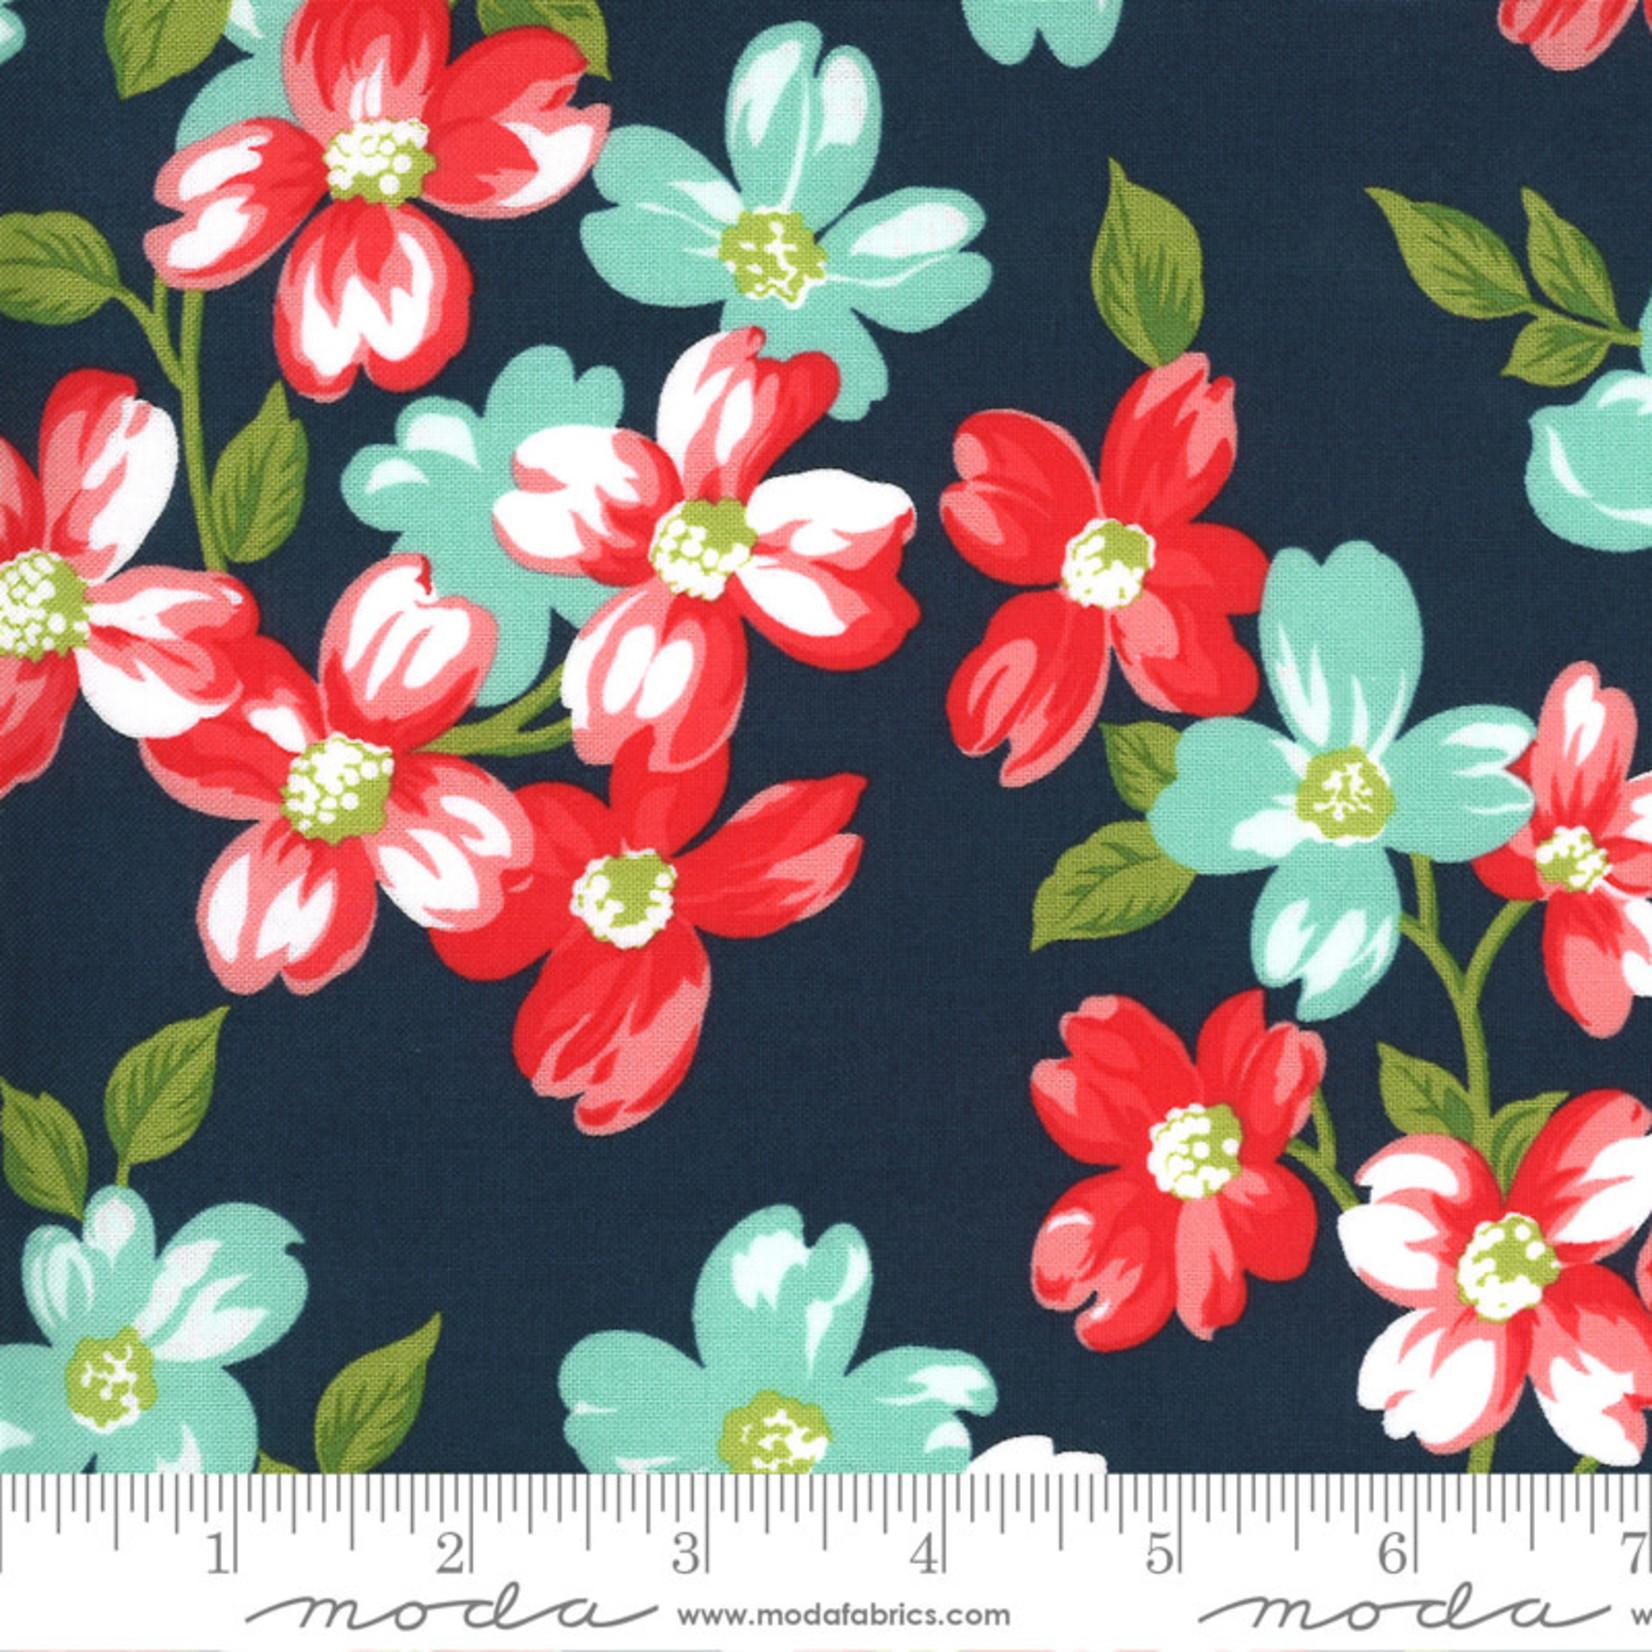 Bonnie & Camille Sunday Stroll, Full Bloom, Navy 55220 15 $0.20 per cm or $20/m